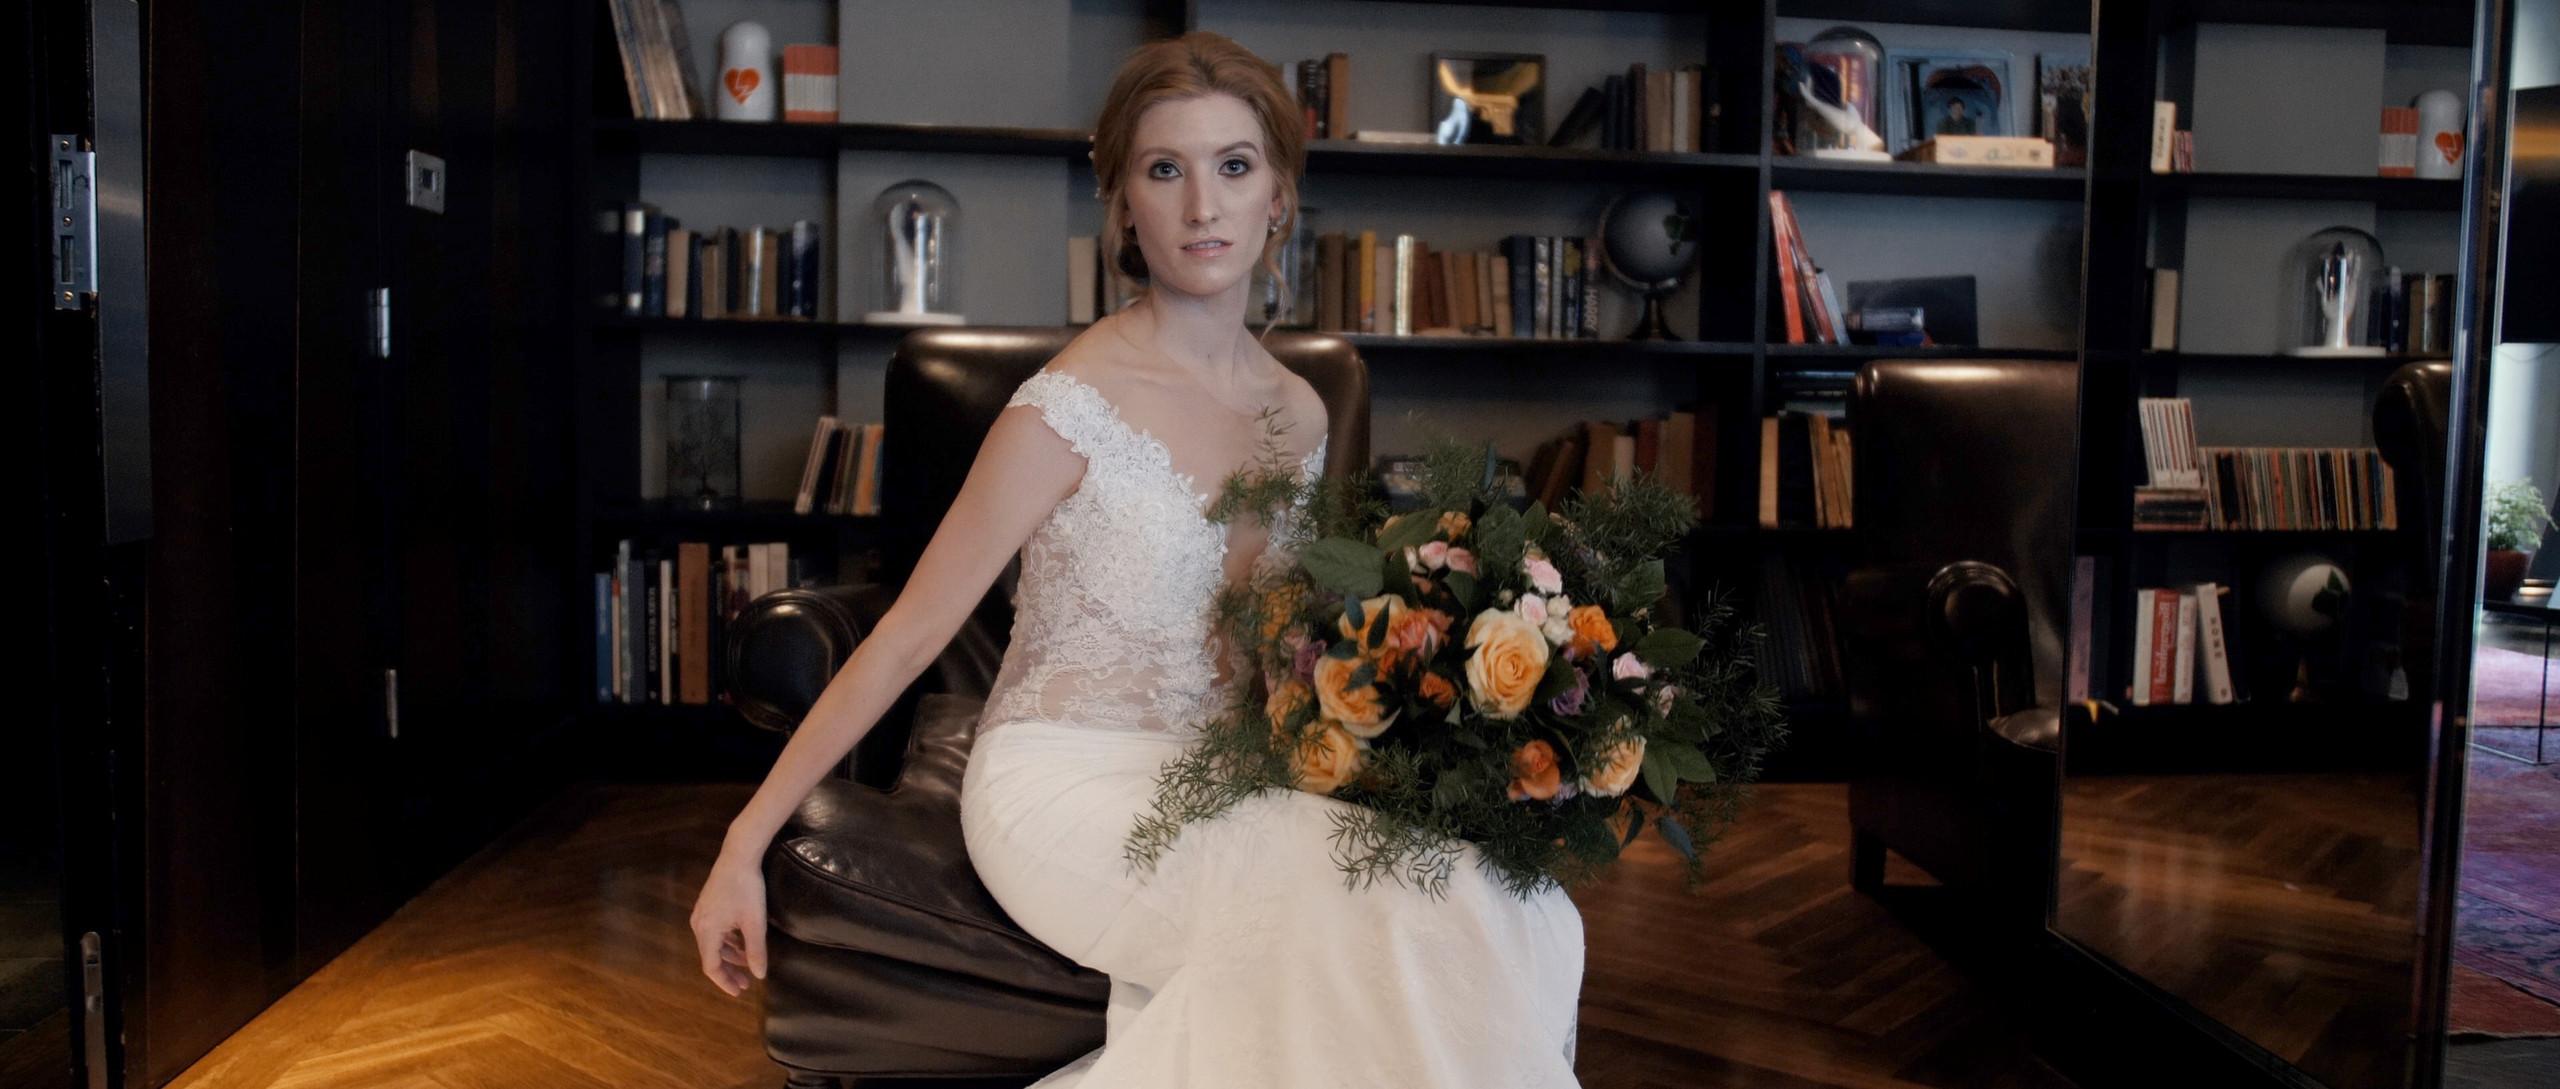 Bride sitting with flowers aloha london wedding films videographer